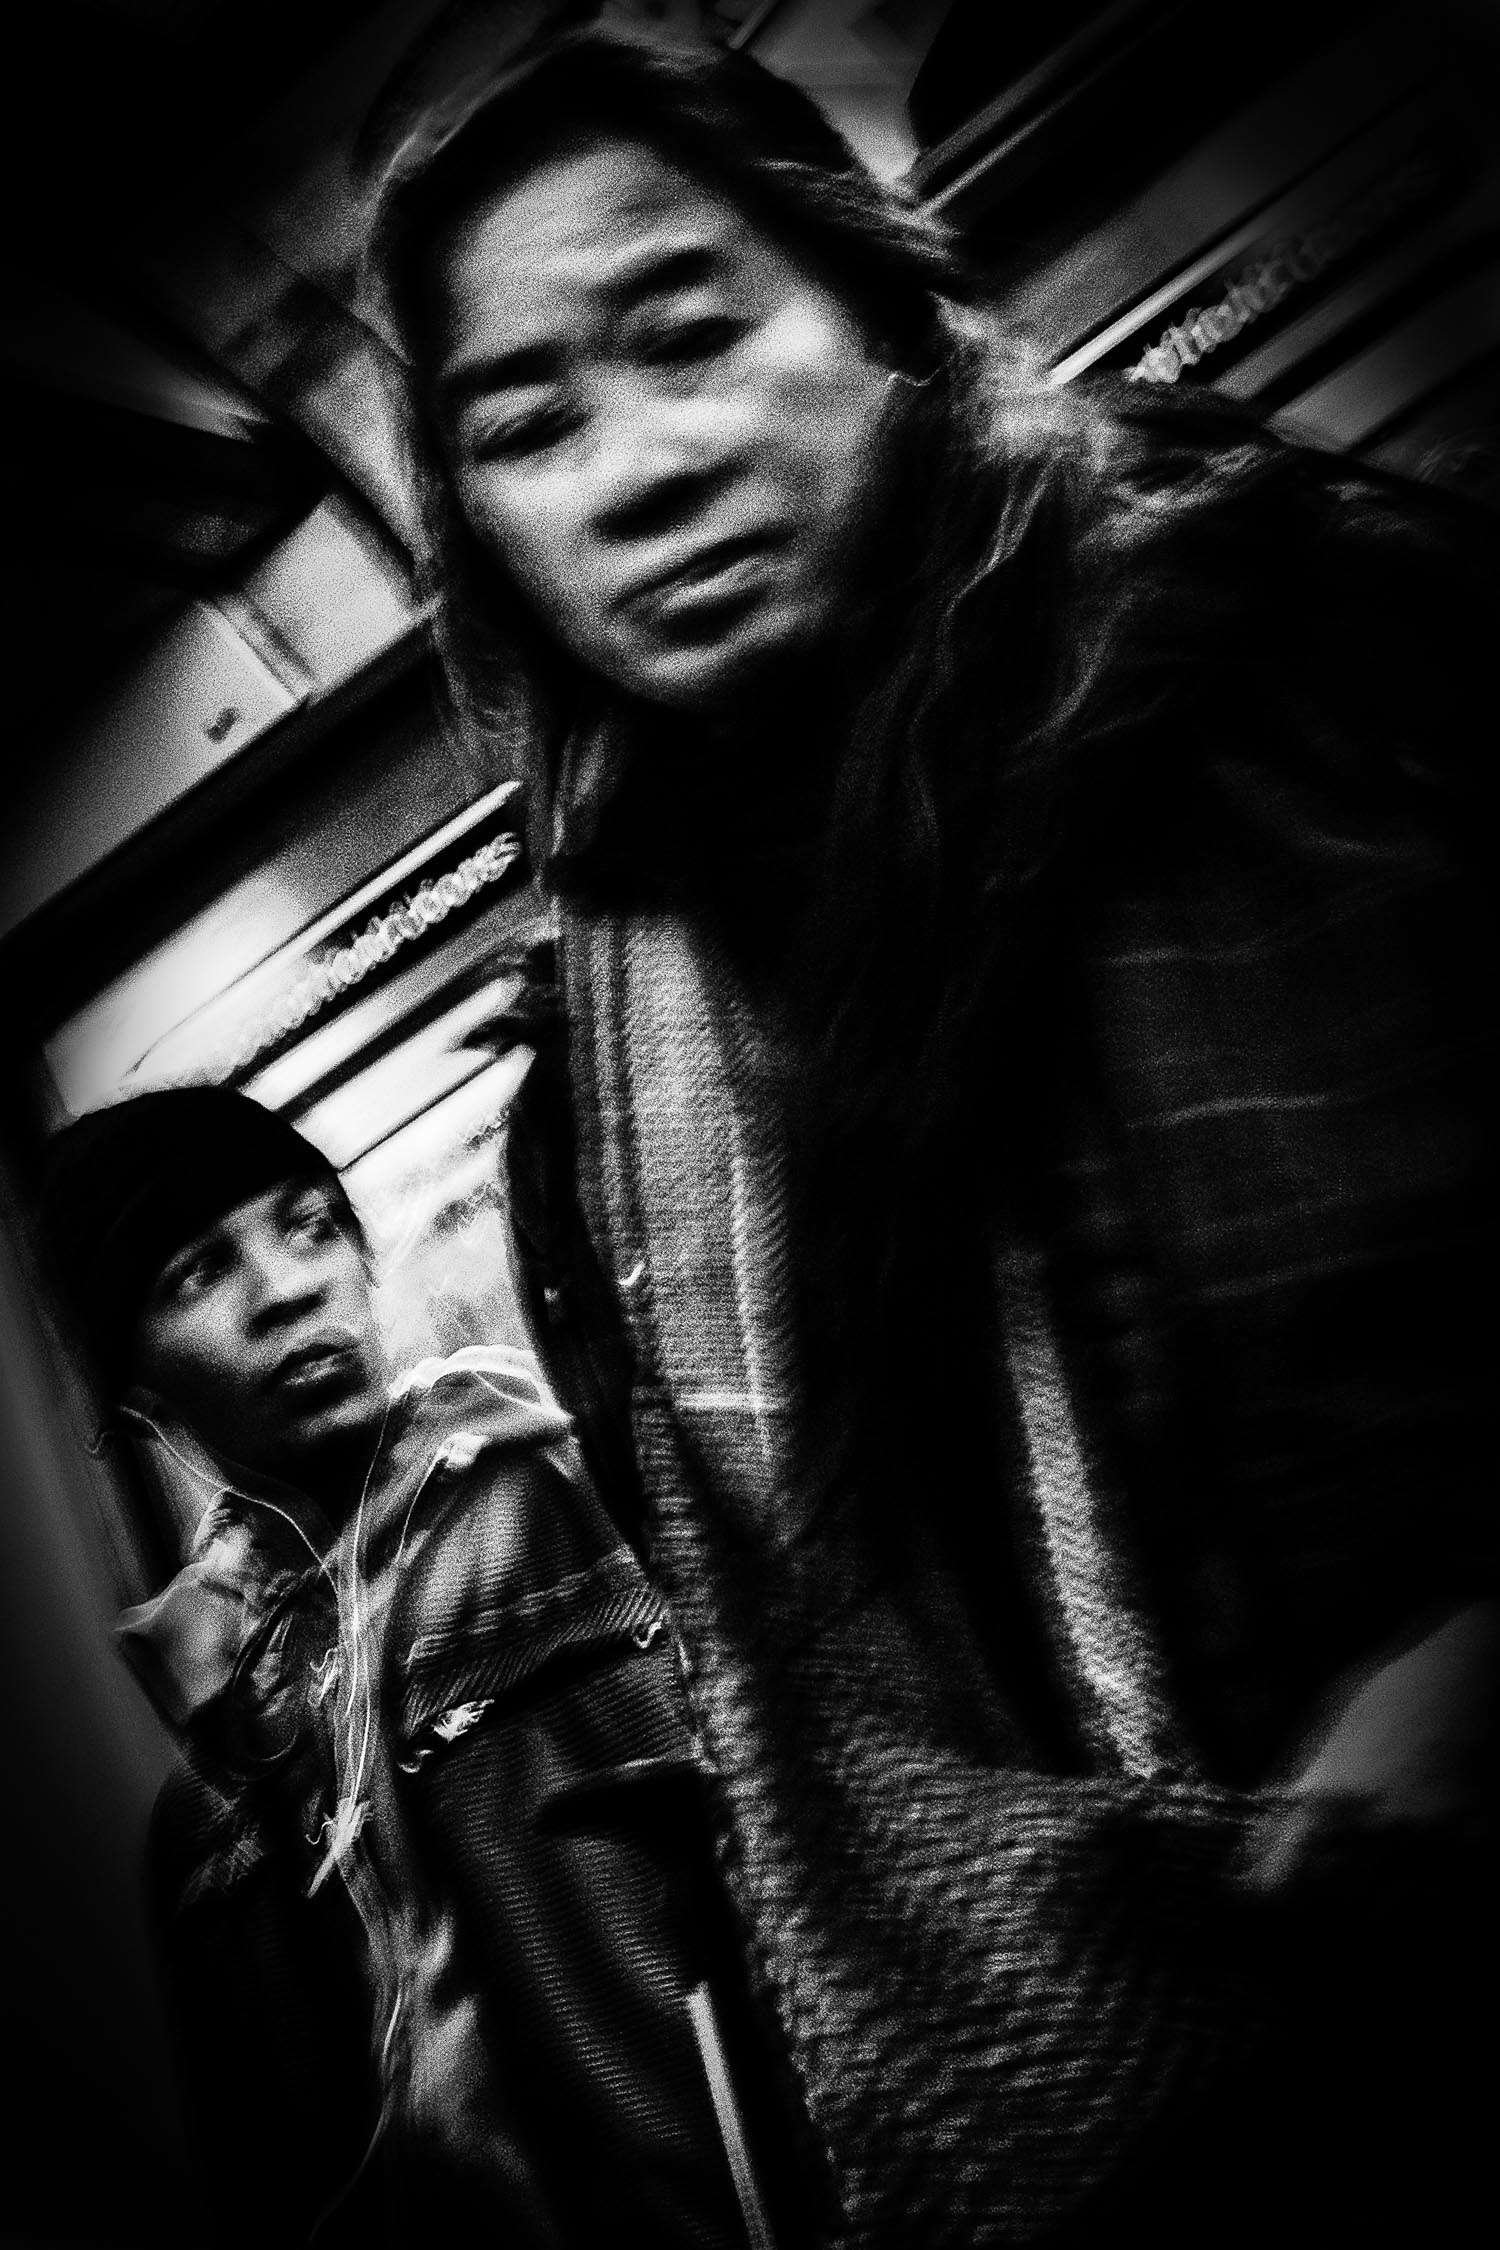 subway_10x15_14.jpg